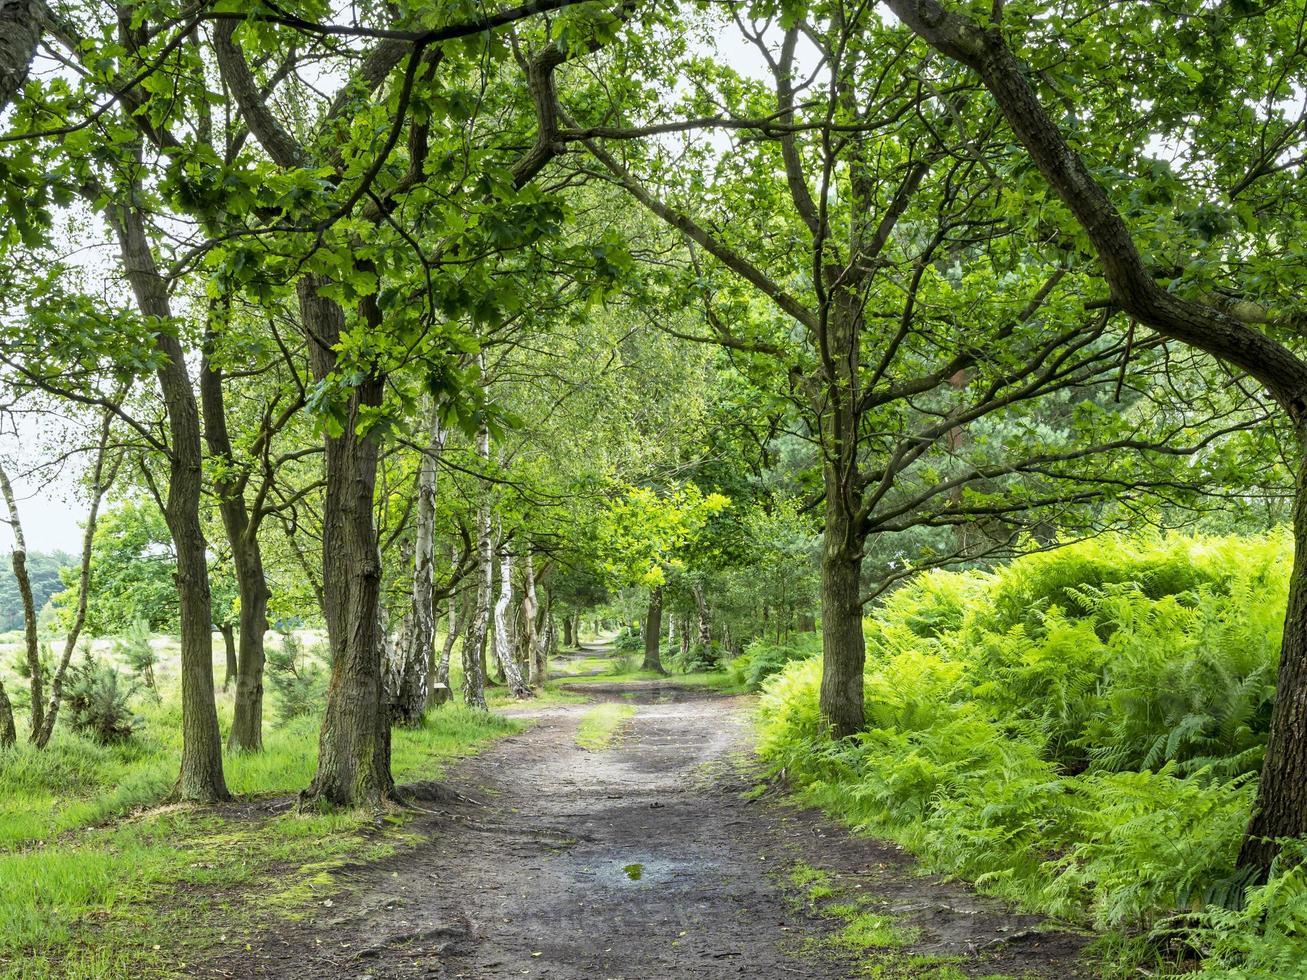 Sentier à travers les arbres à Skipwith Common, North Yorkshire, Angleterre photo